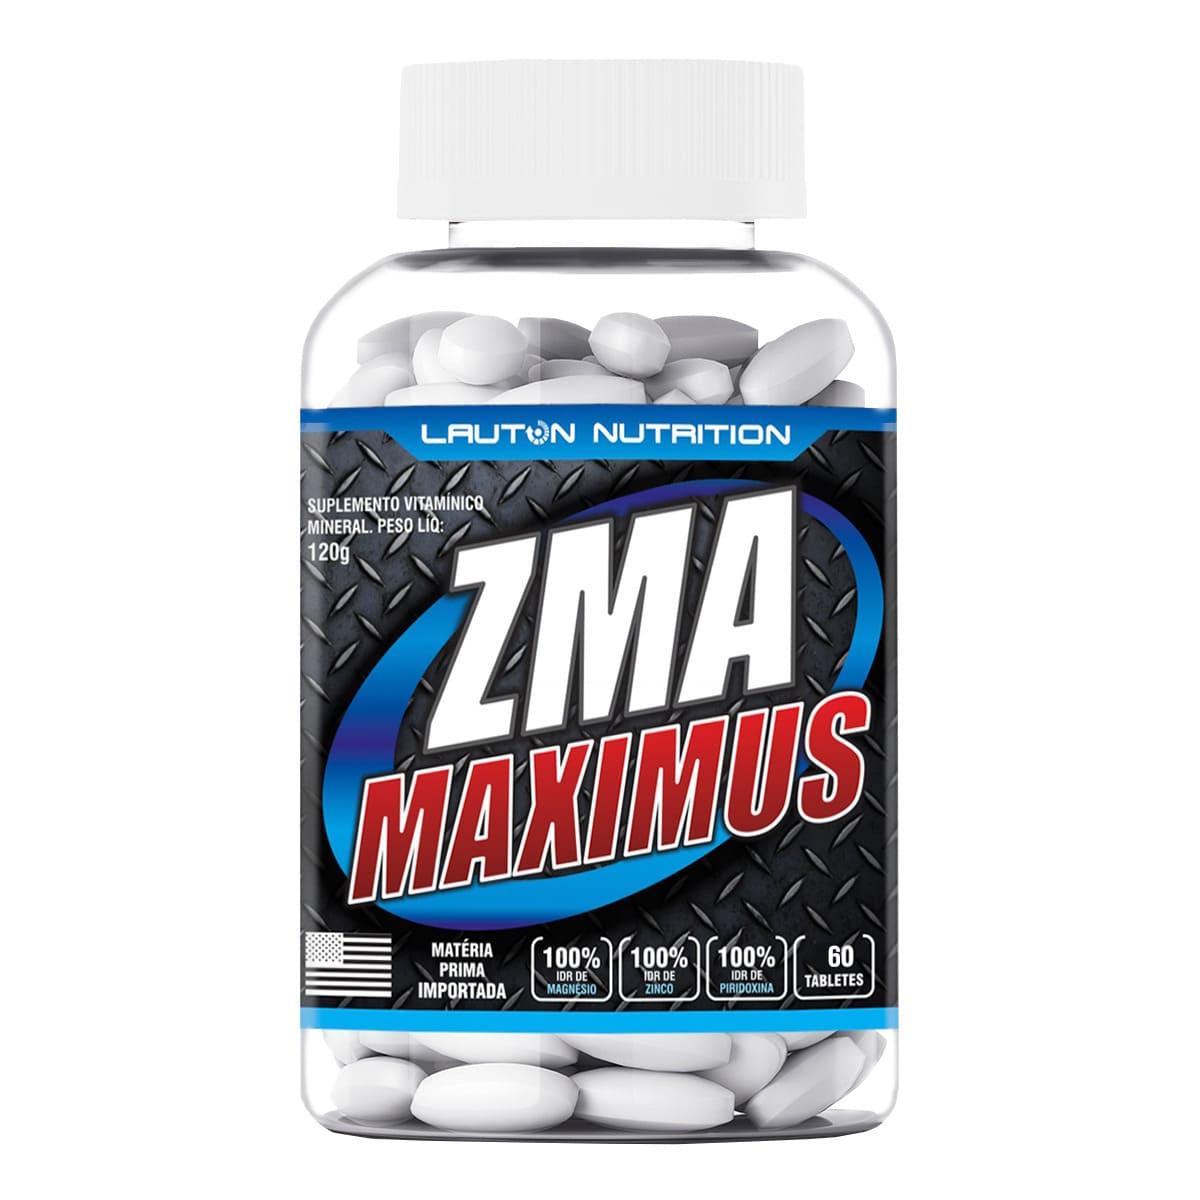 ZMA Maximus Lauton Nutrition - 60 Tablets 1G